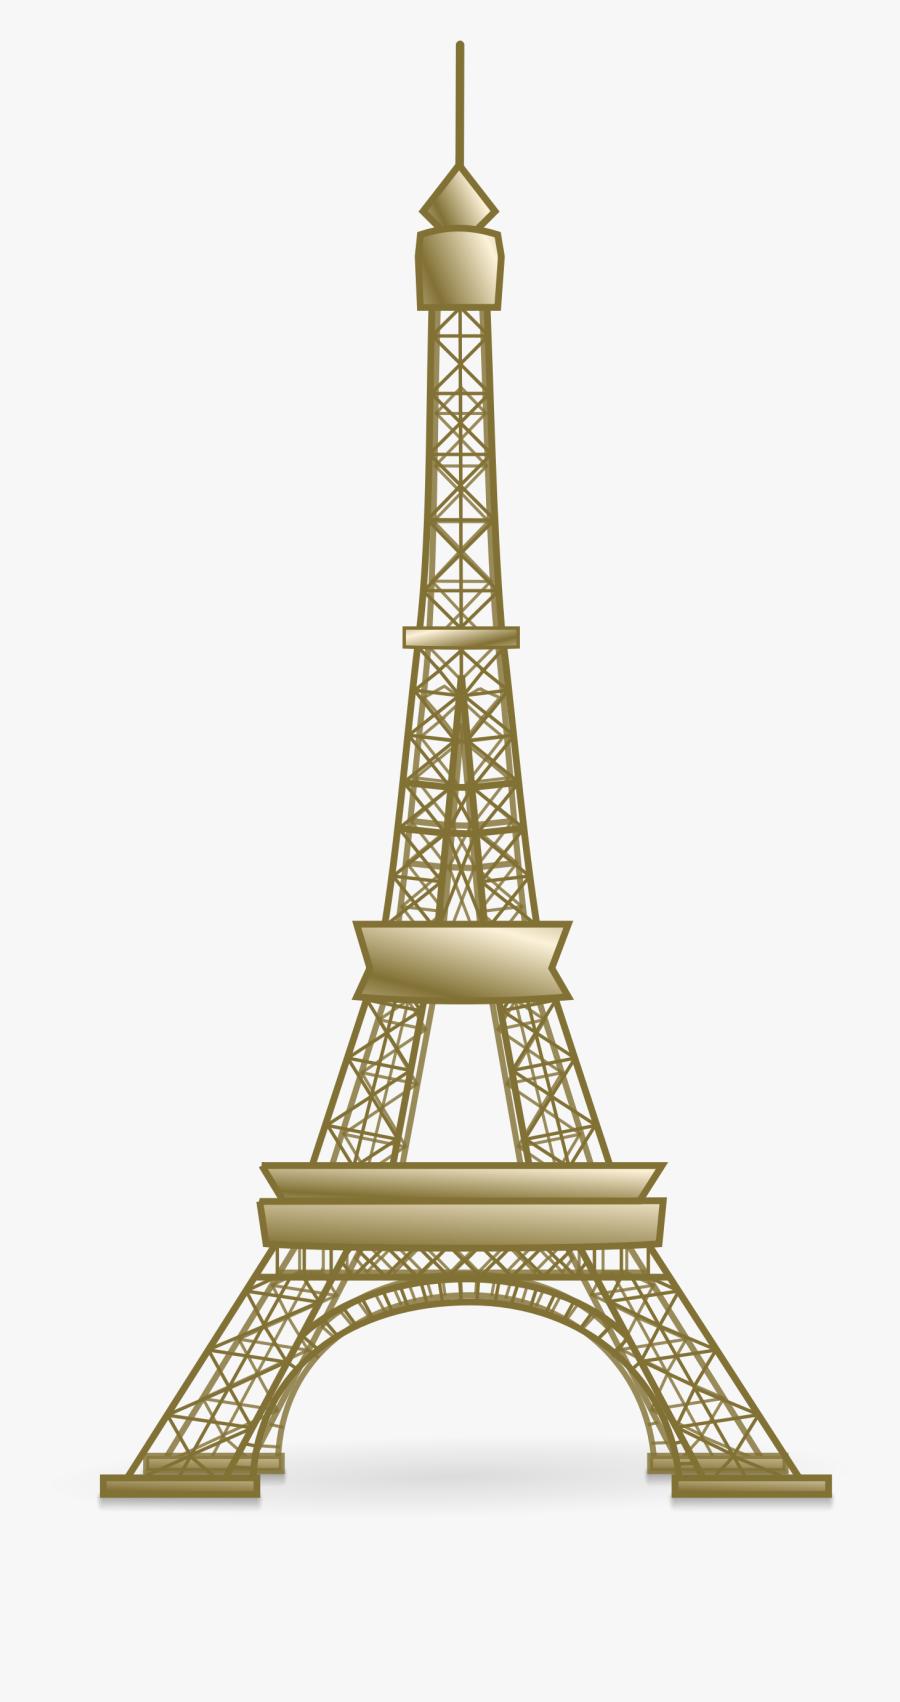 Other Clipart Eiffel Tower - Eiffel Tower Clip Art, Transparent Clipart